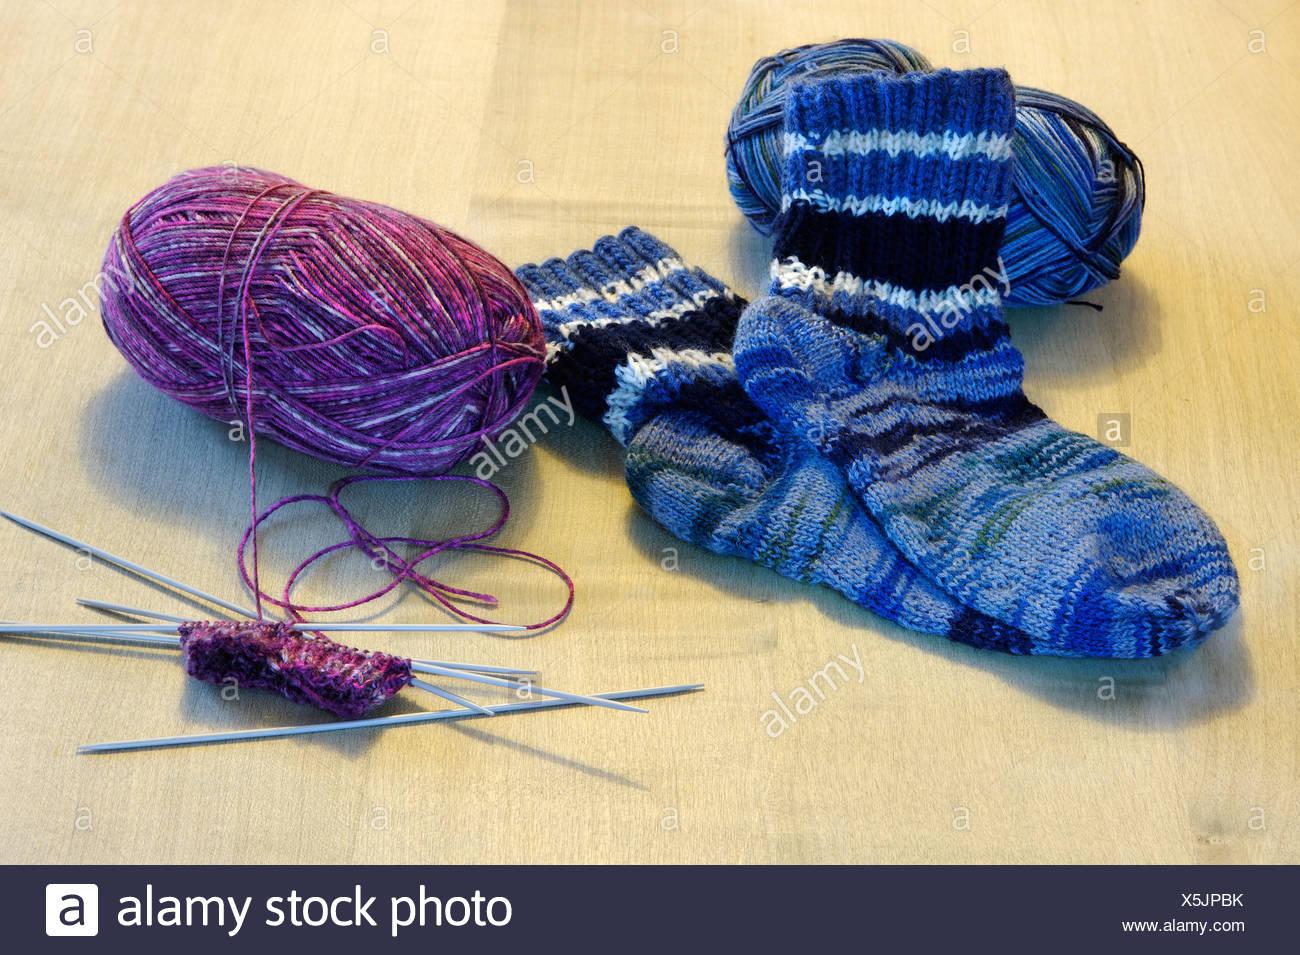 Knitting of socks, wool, knitting needles - Stock Image